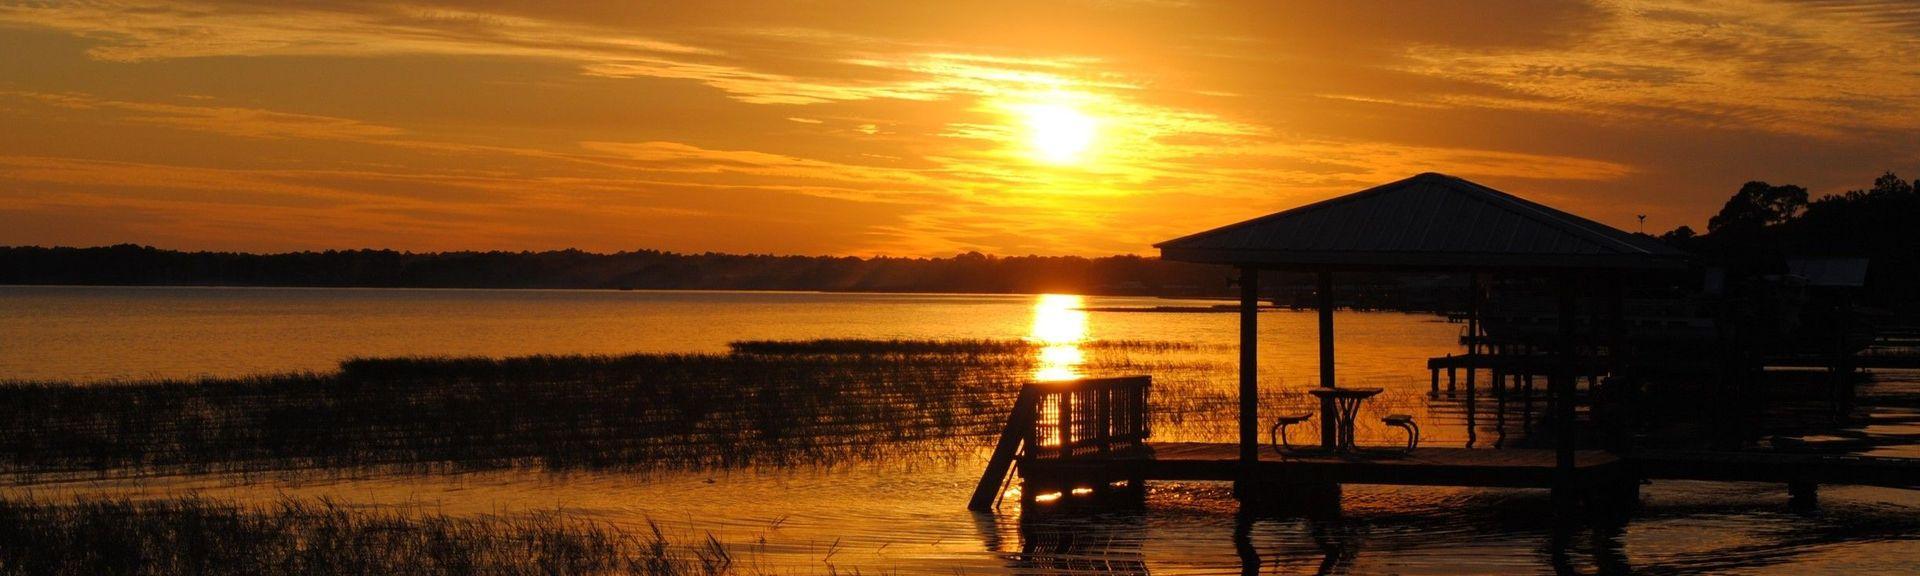 Lake June-in-Winter Scrub State Park, Lake Placid, Florida, United States